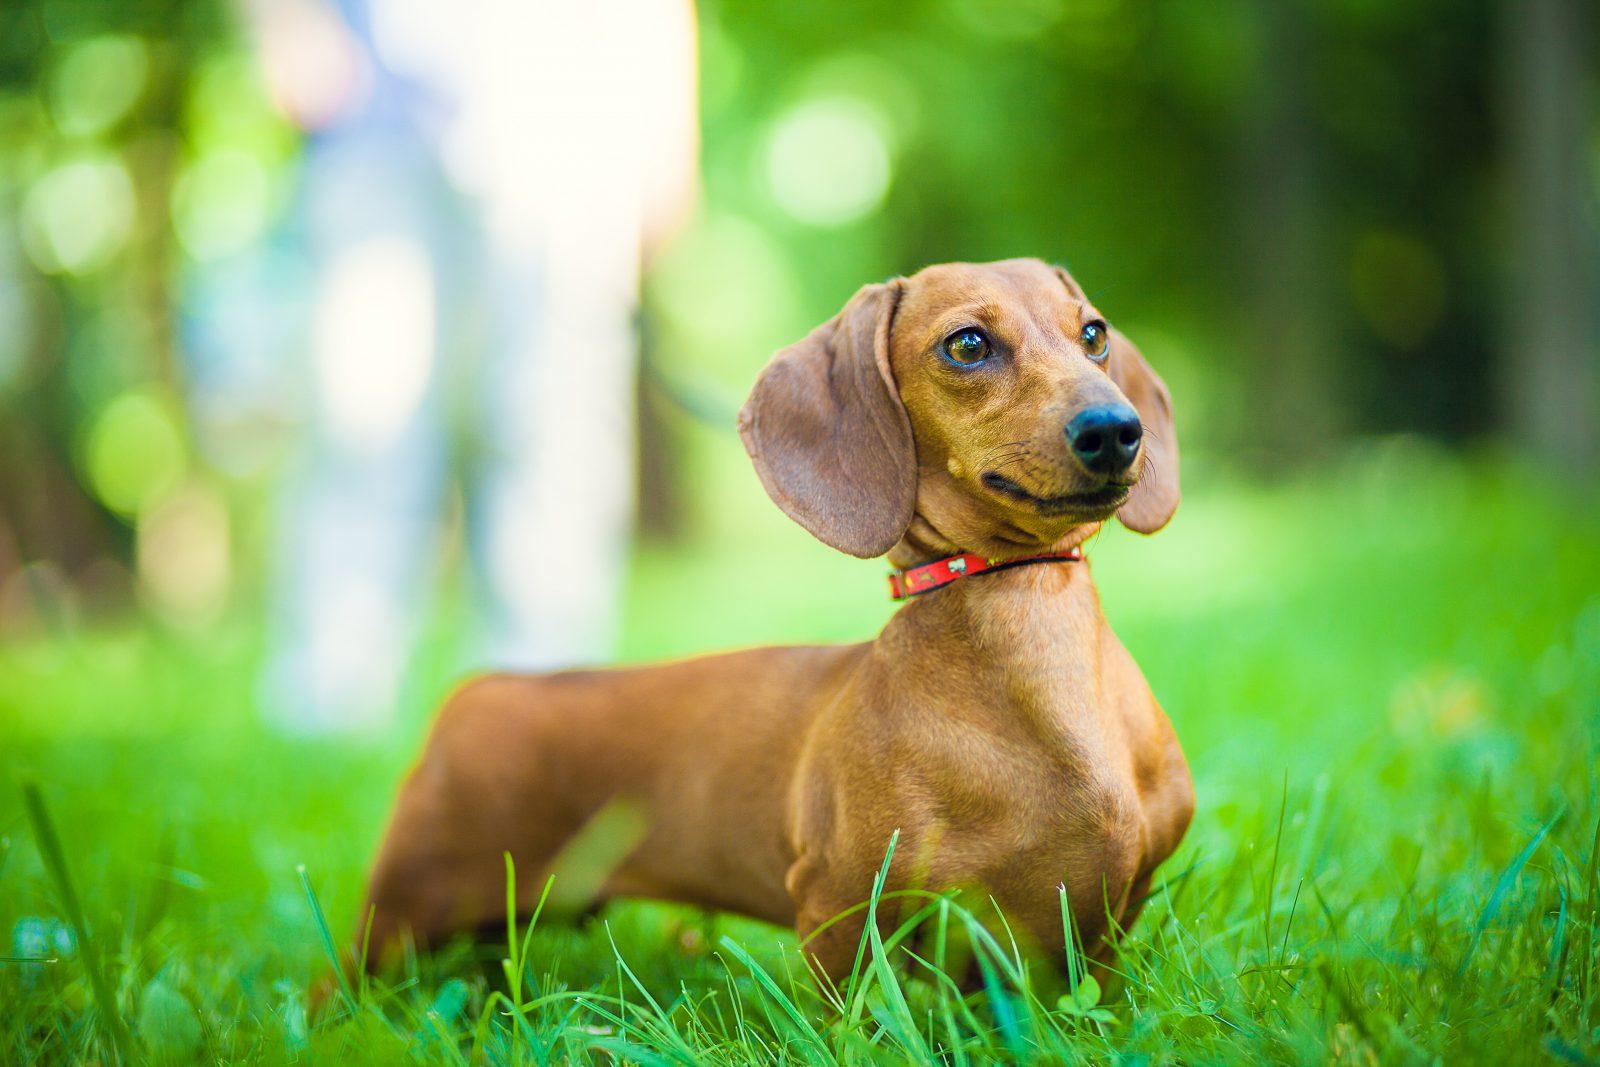 racas-popular-cachorro-arruinadas-dachshund